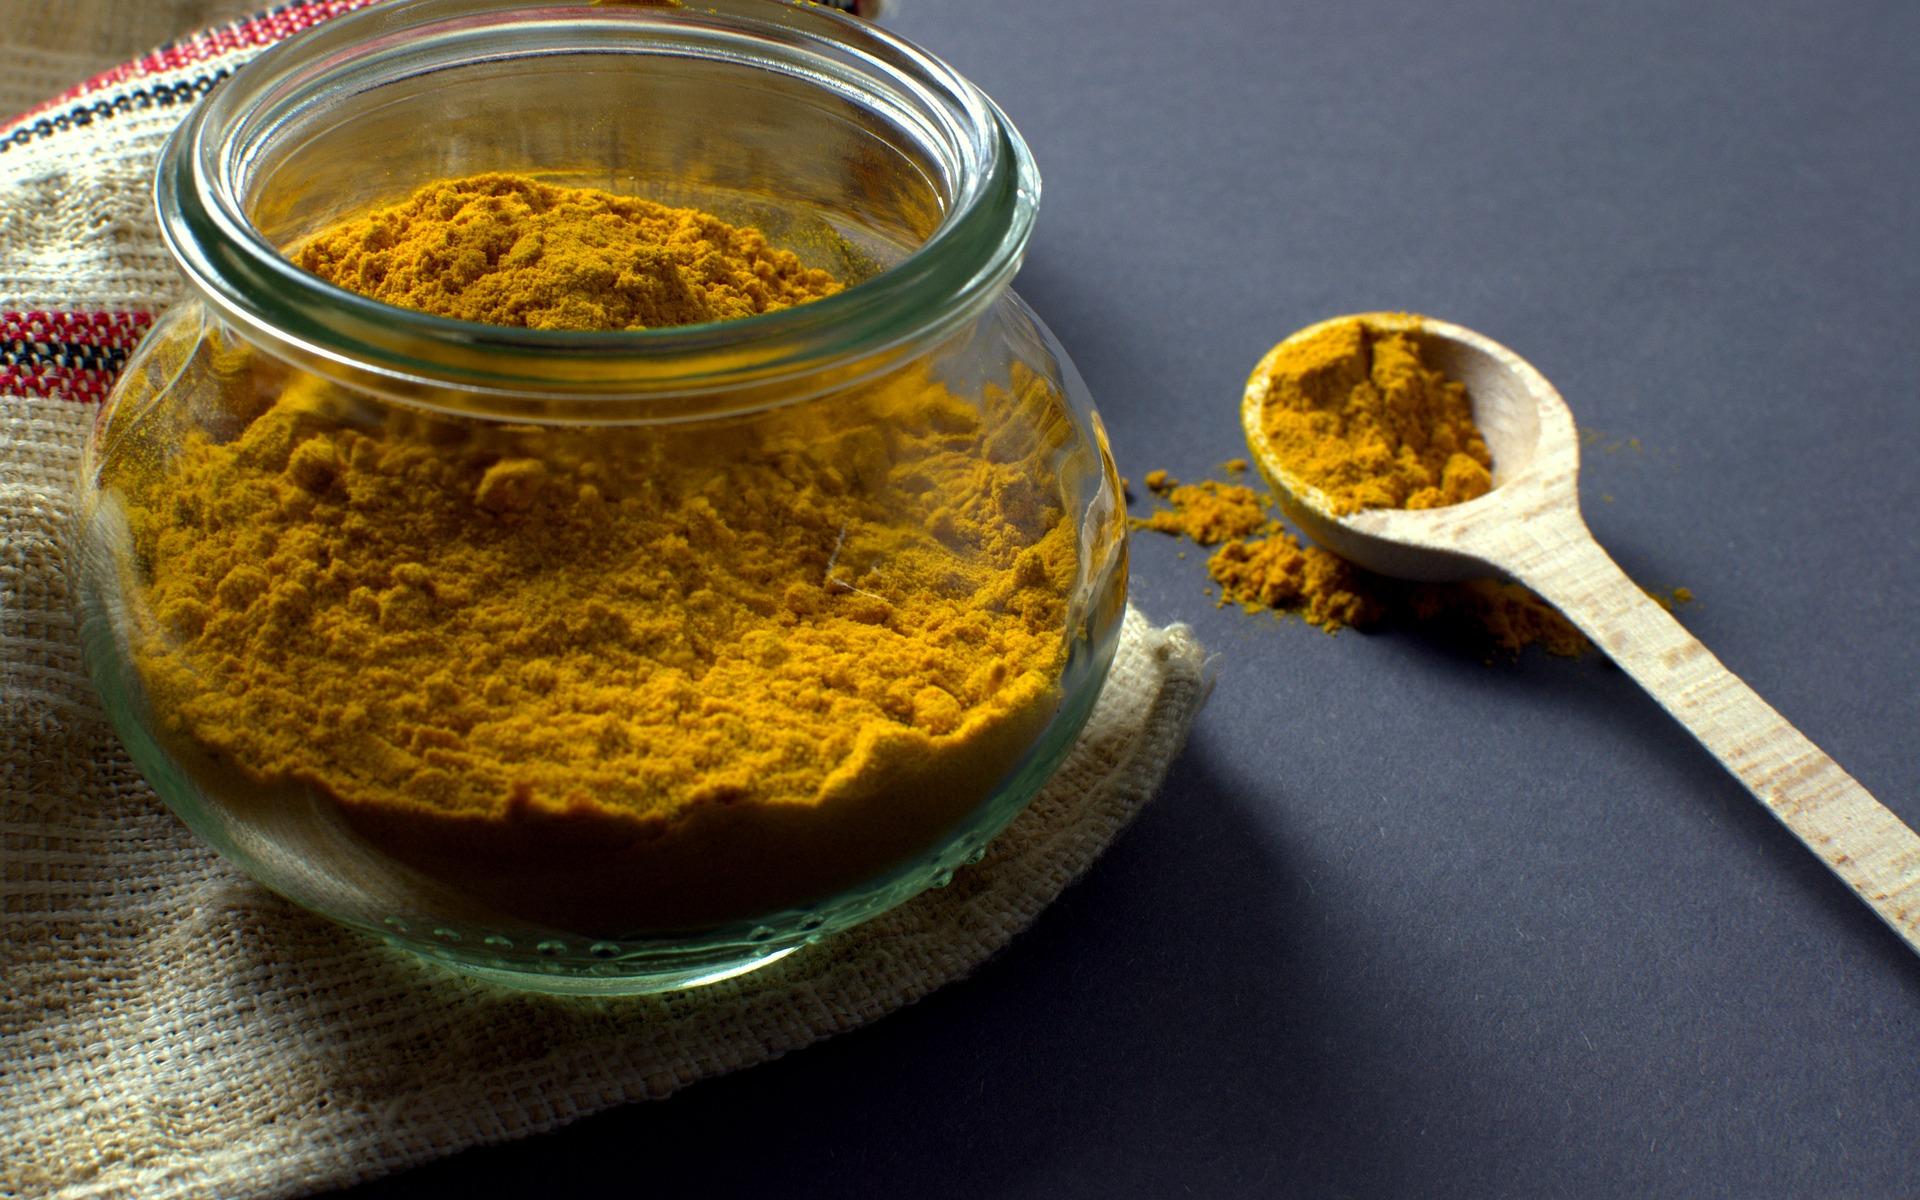 turmeric powder in a bowl